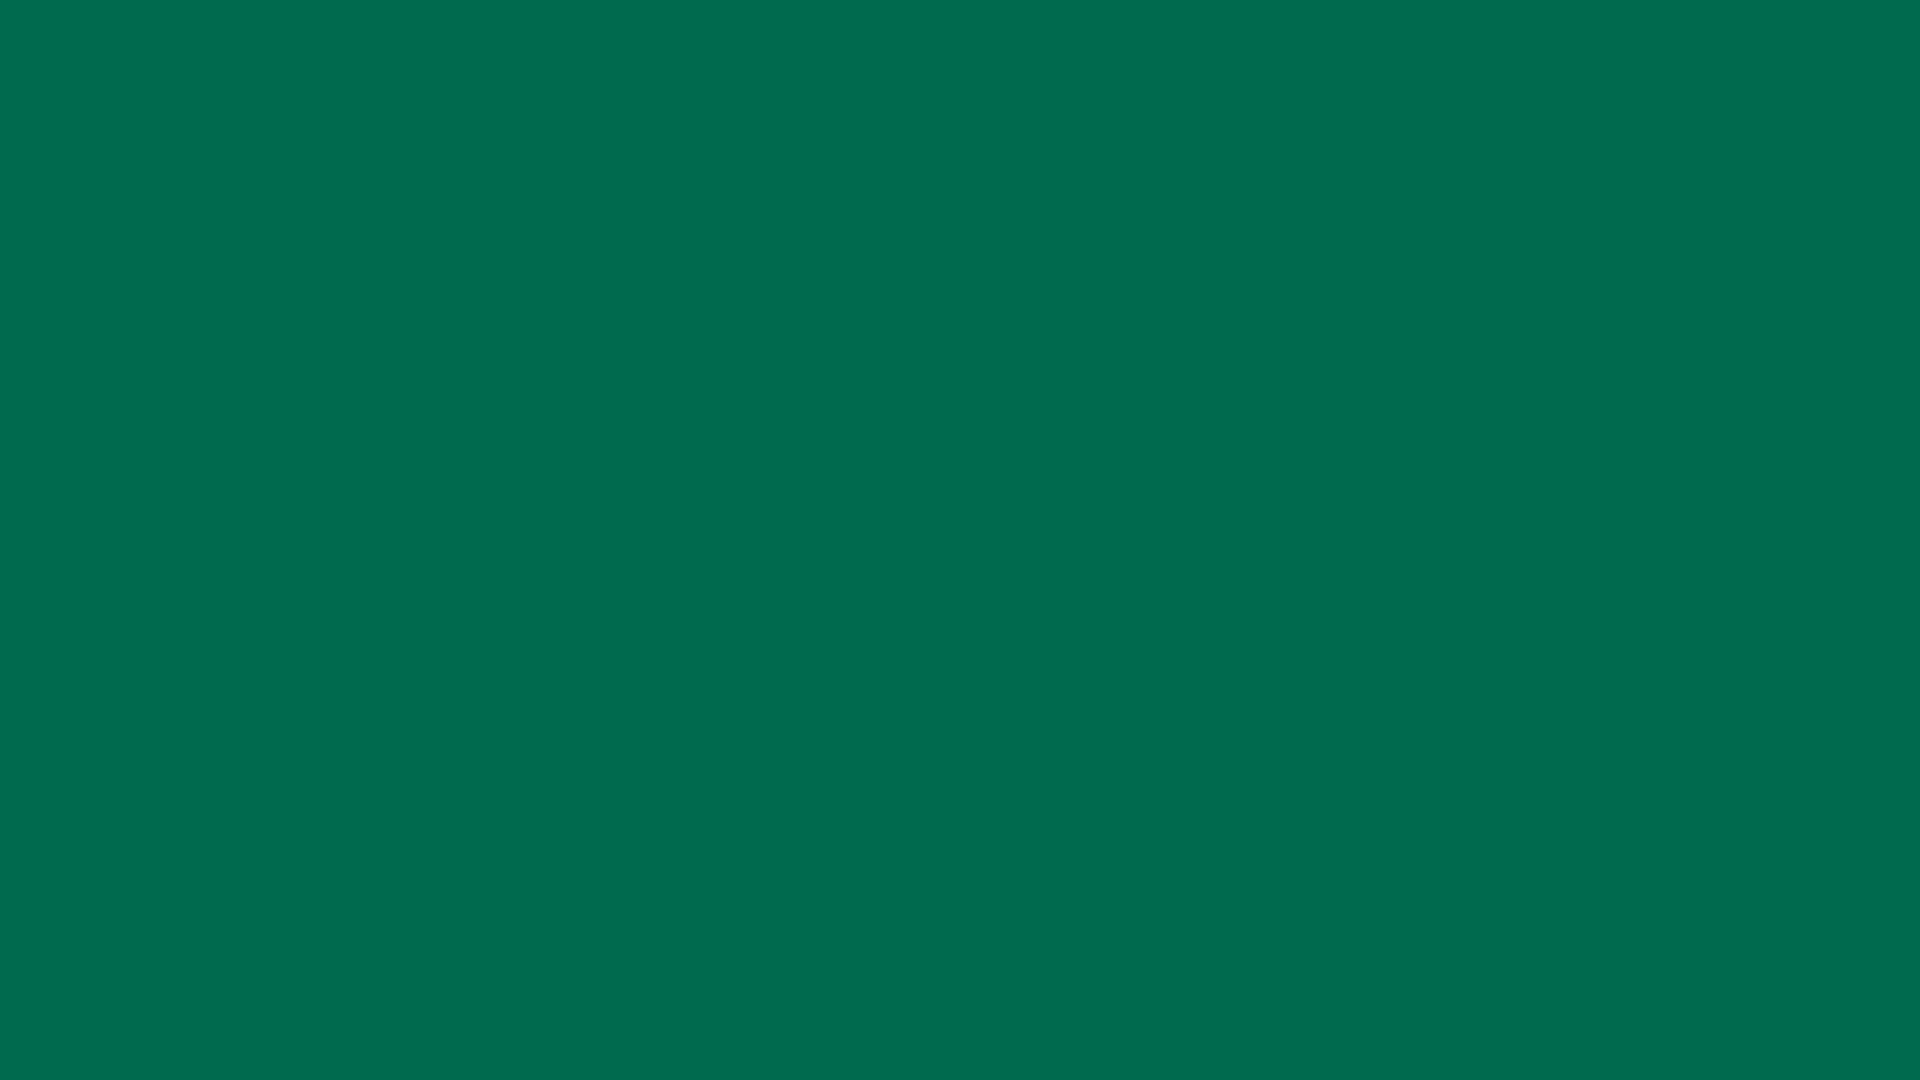 1920x1080 Bottle Green Solid Color Background